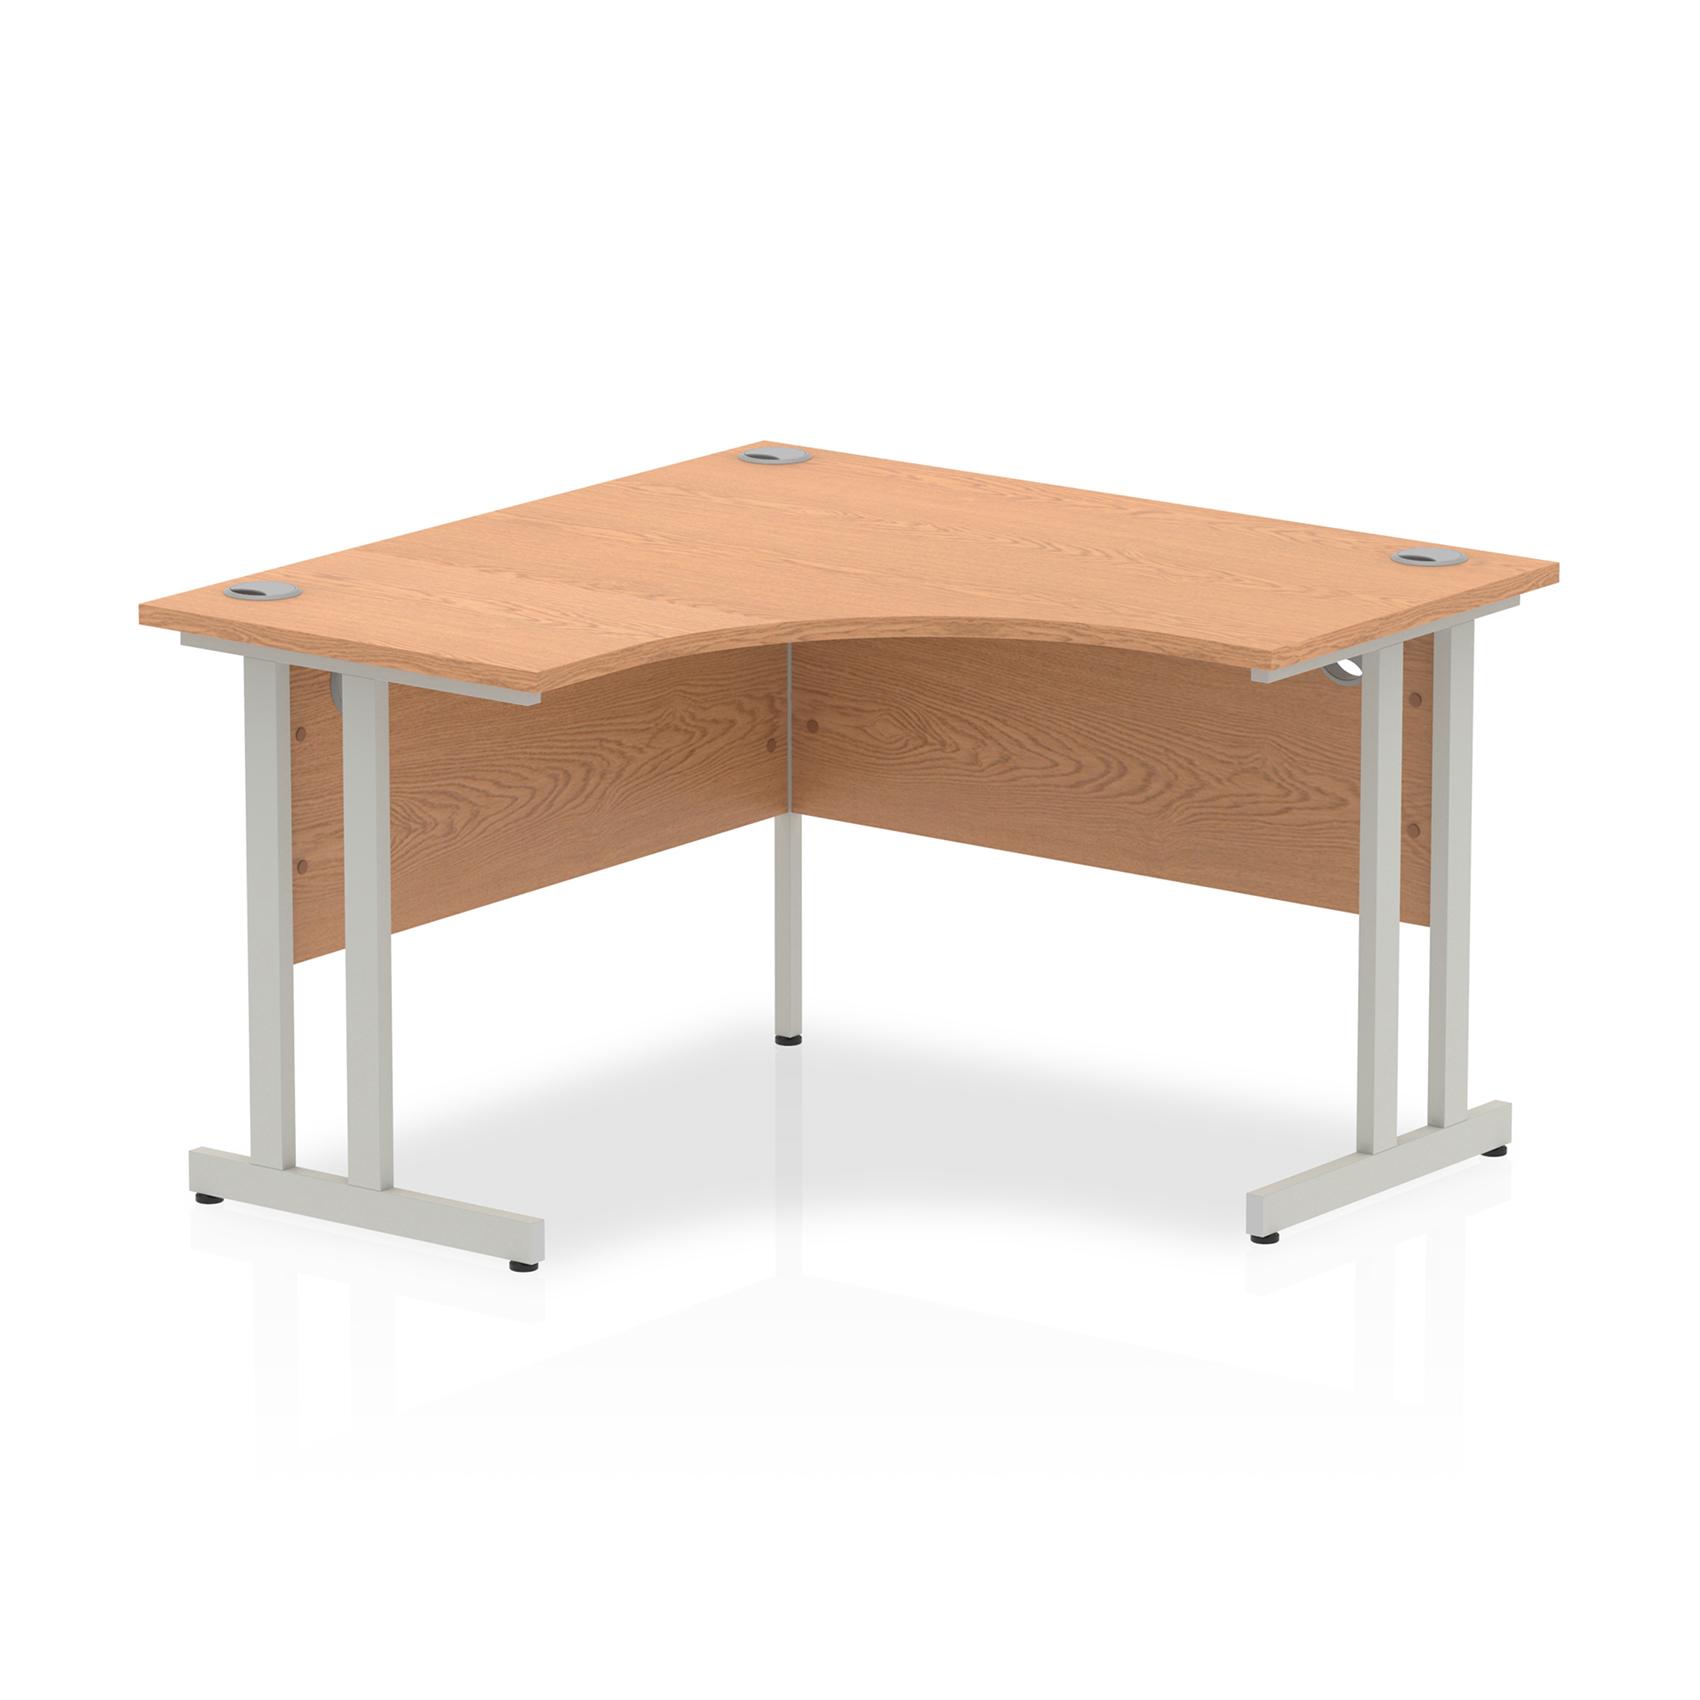 Trexus Call Centre Desk Cantilever 1200x1200mm Oak Ref I000819